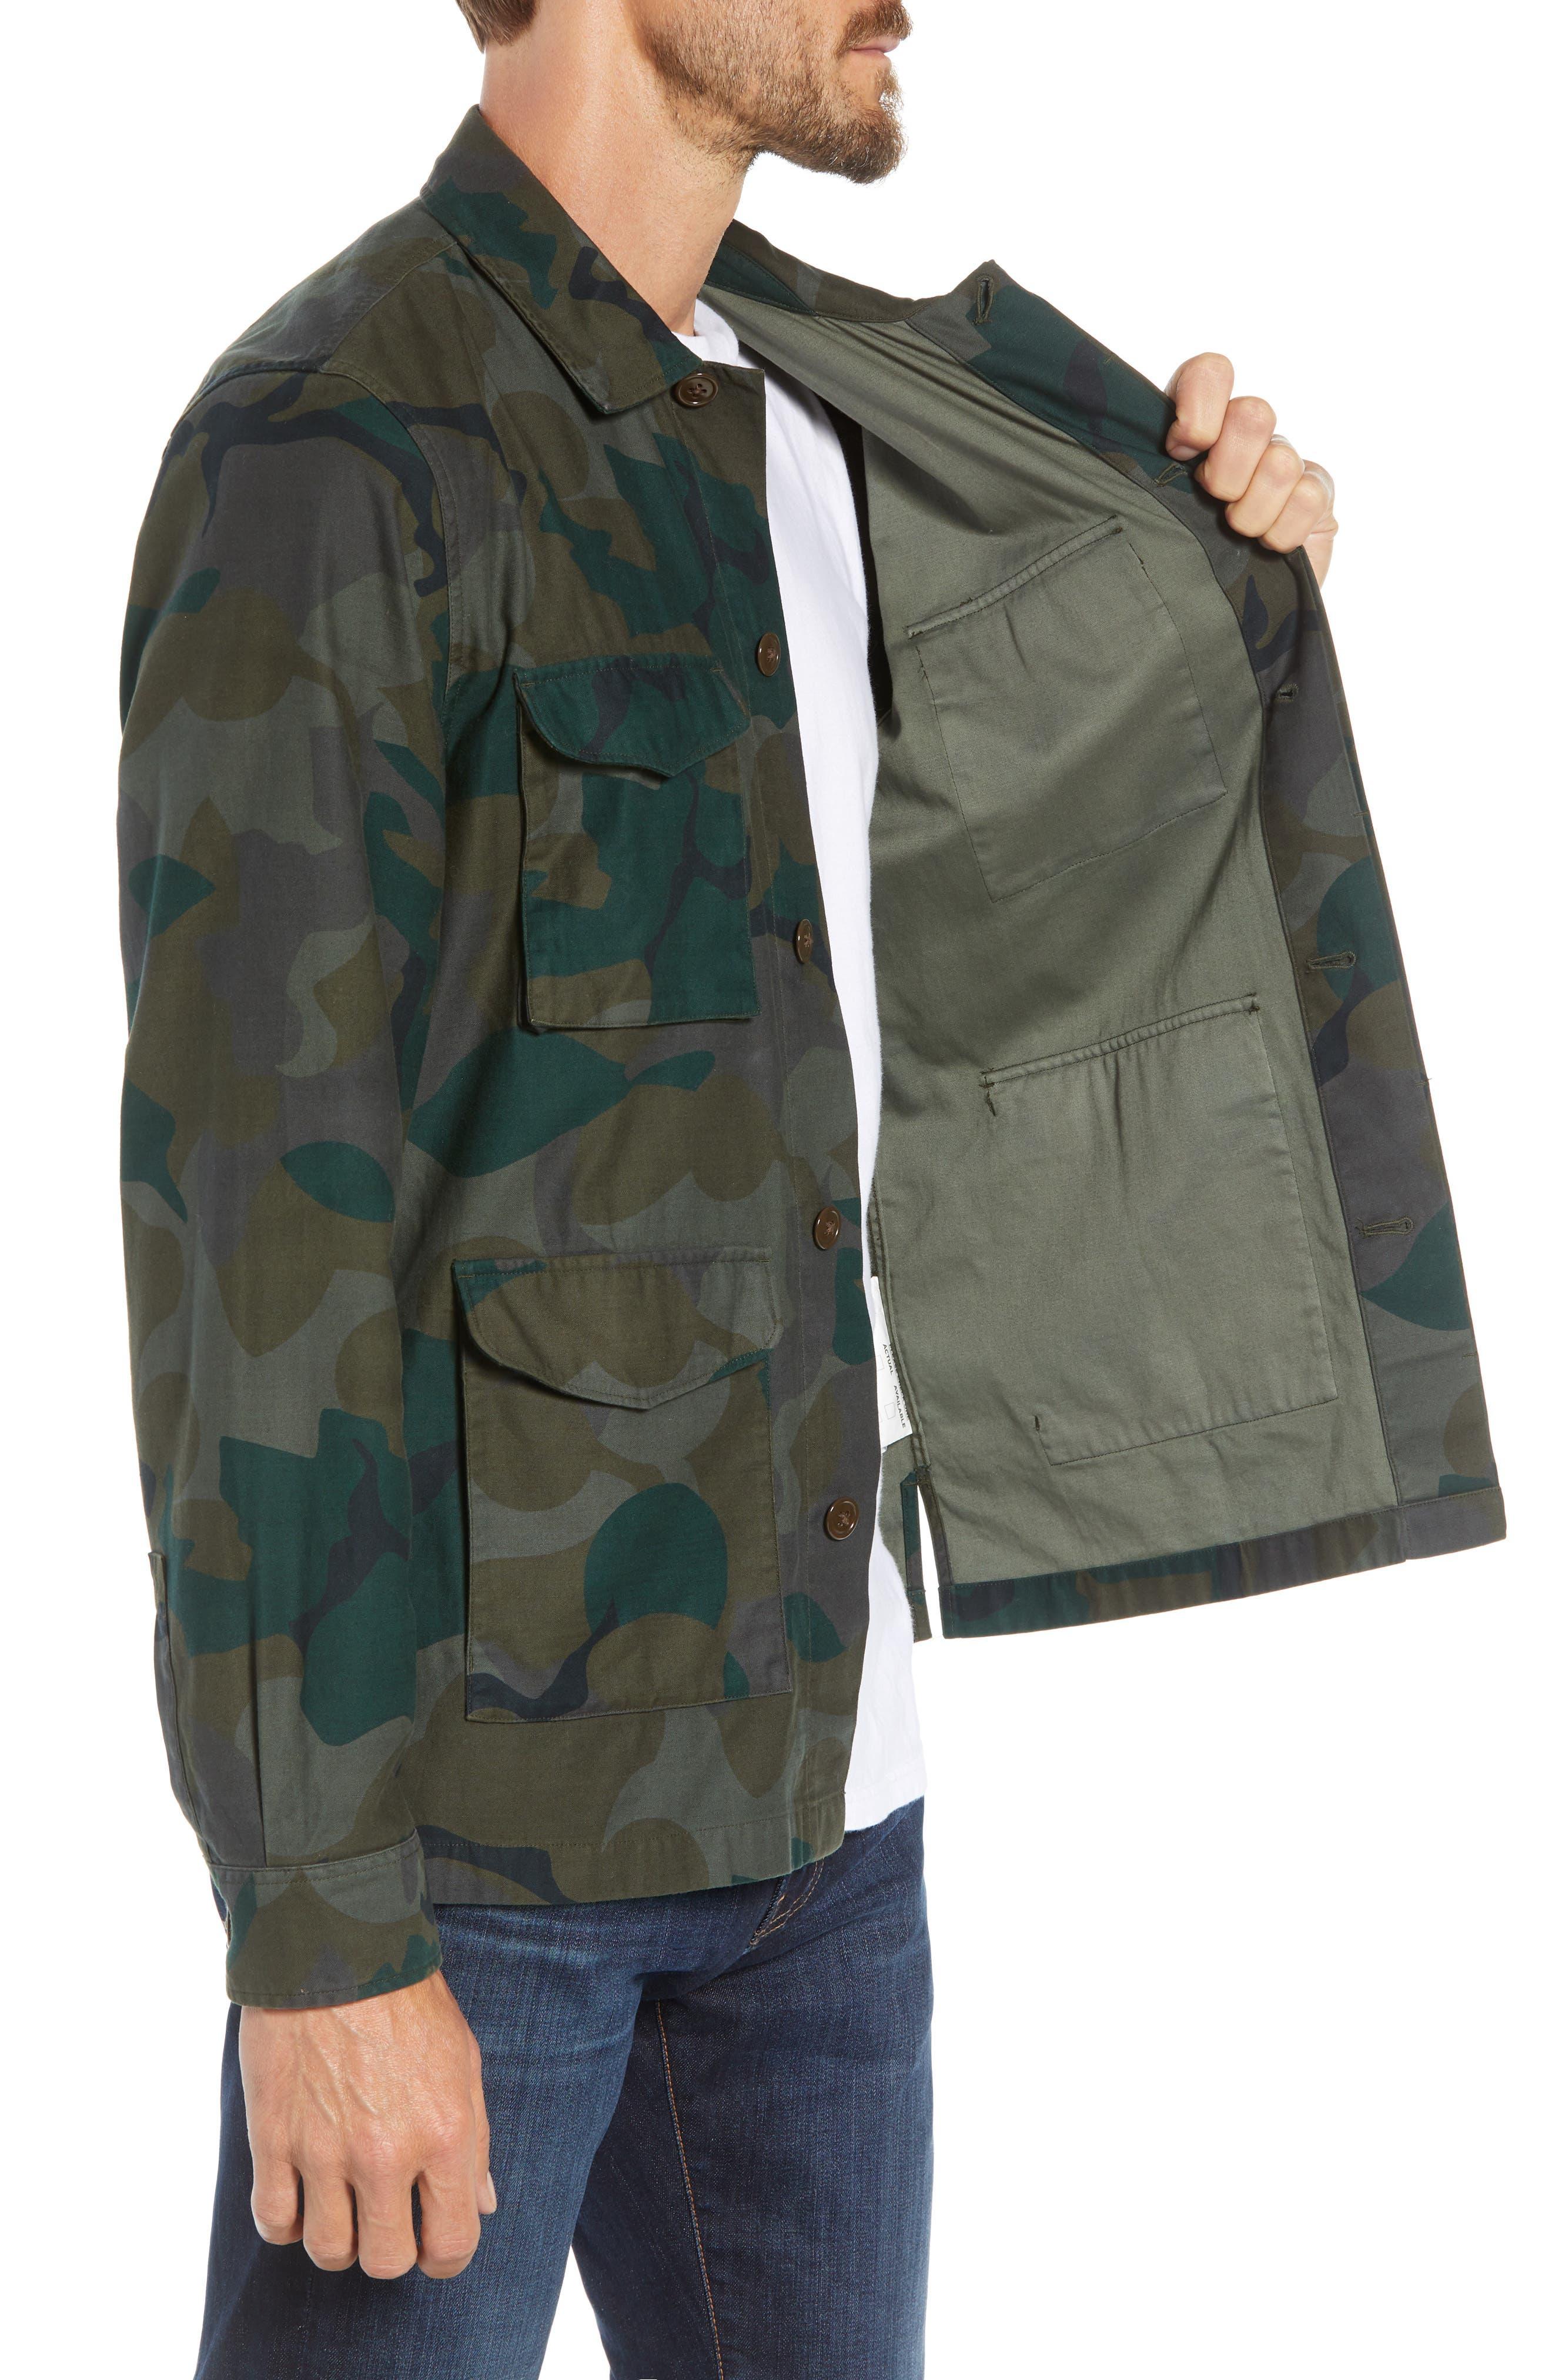 Four-Pocket Military Jacket,                             Alternate thumbnail 3, color,                             301